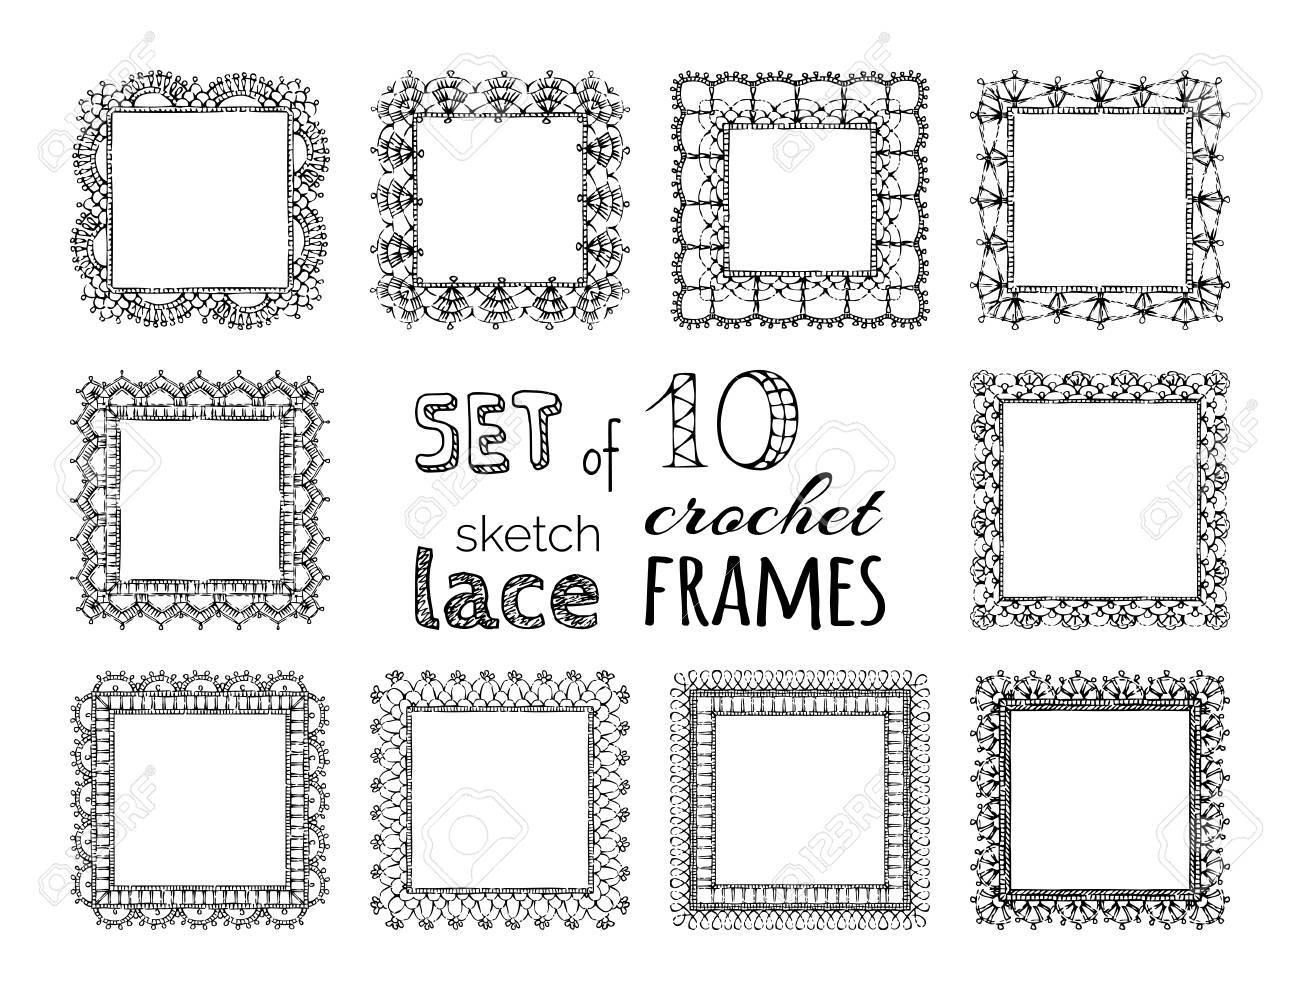 Vector Set Of 10 Sketch Lace Crochet Square Frames Ornate Crochet